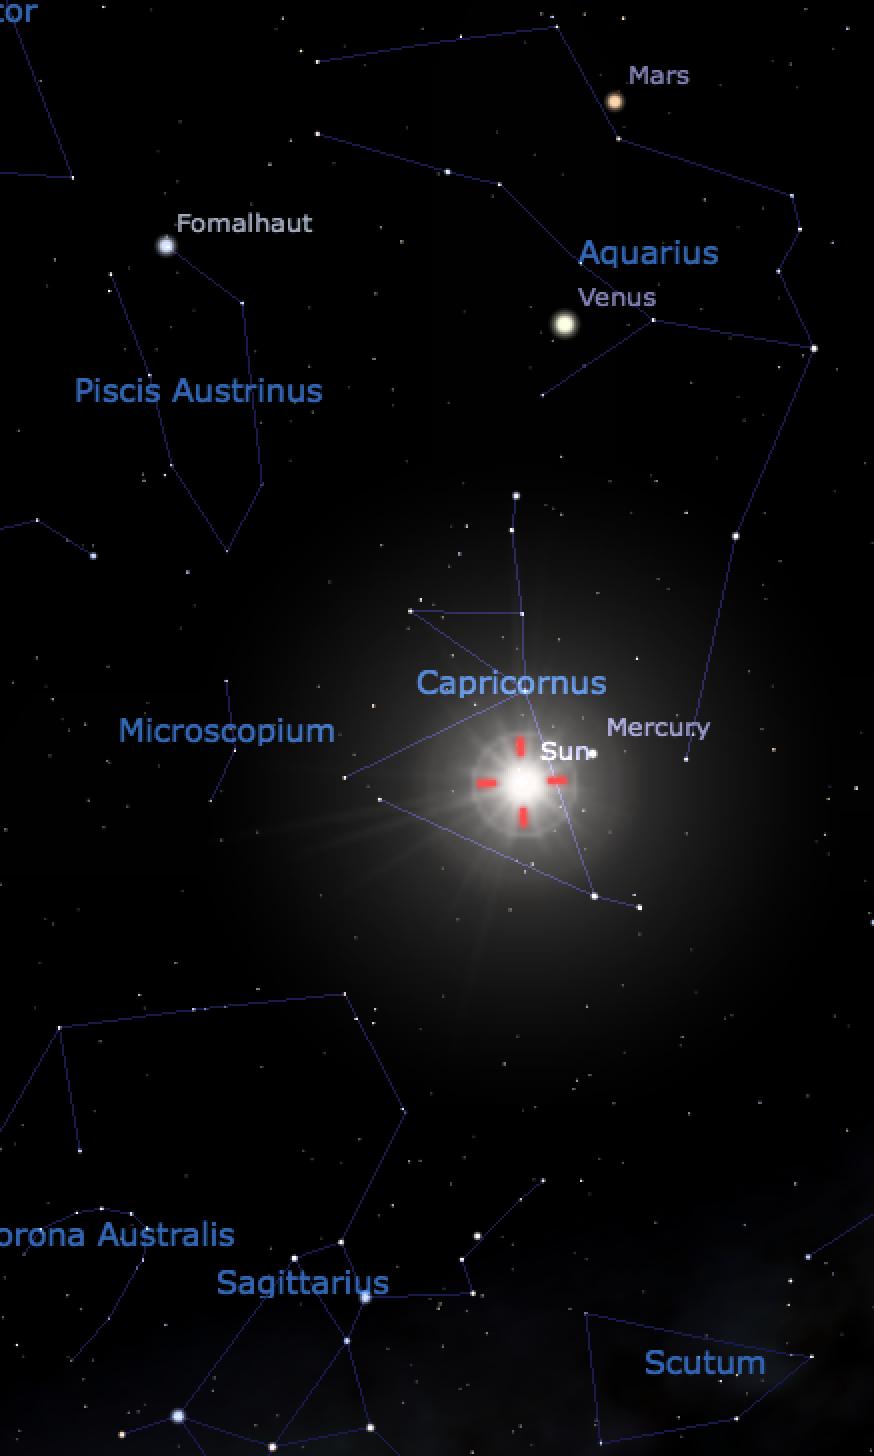 Position of sun on 29th jan 2015 is in capricornus